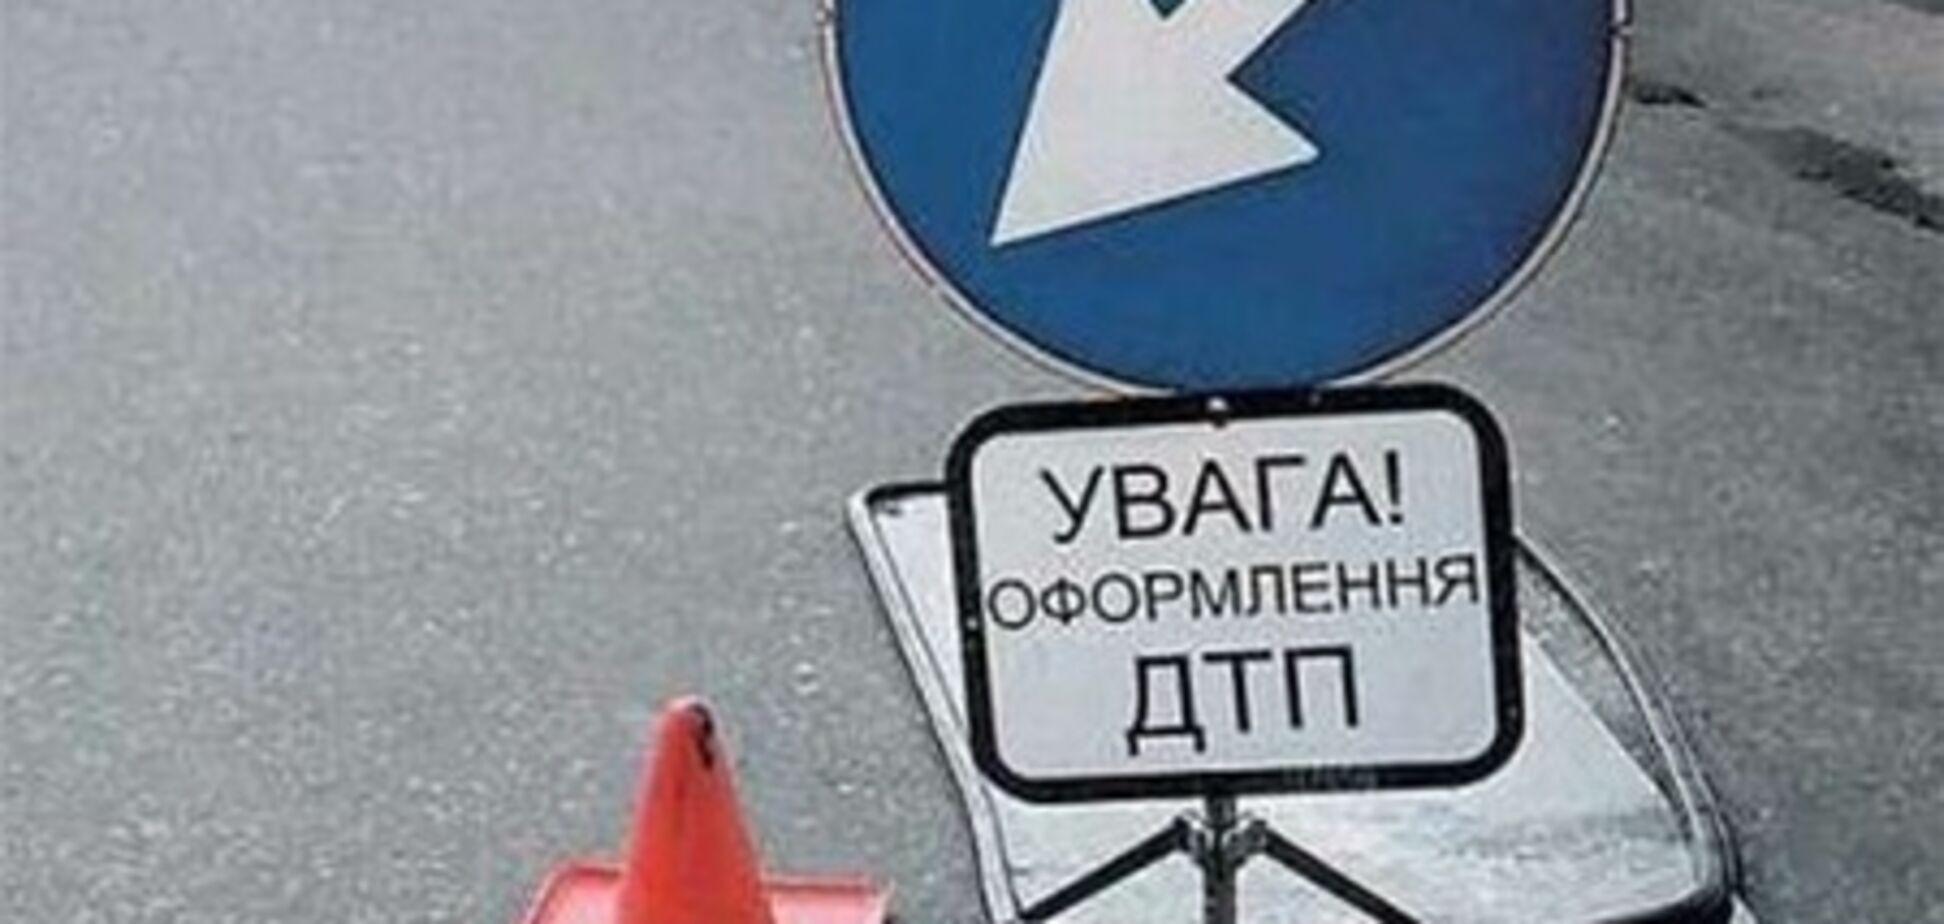 Ситуация на дорогах 8 марта: 52 ДТП, 7 погибших